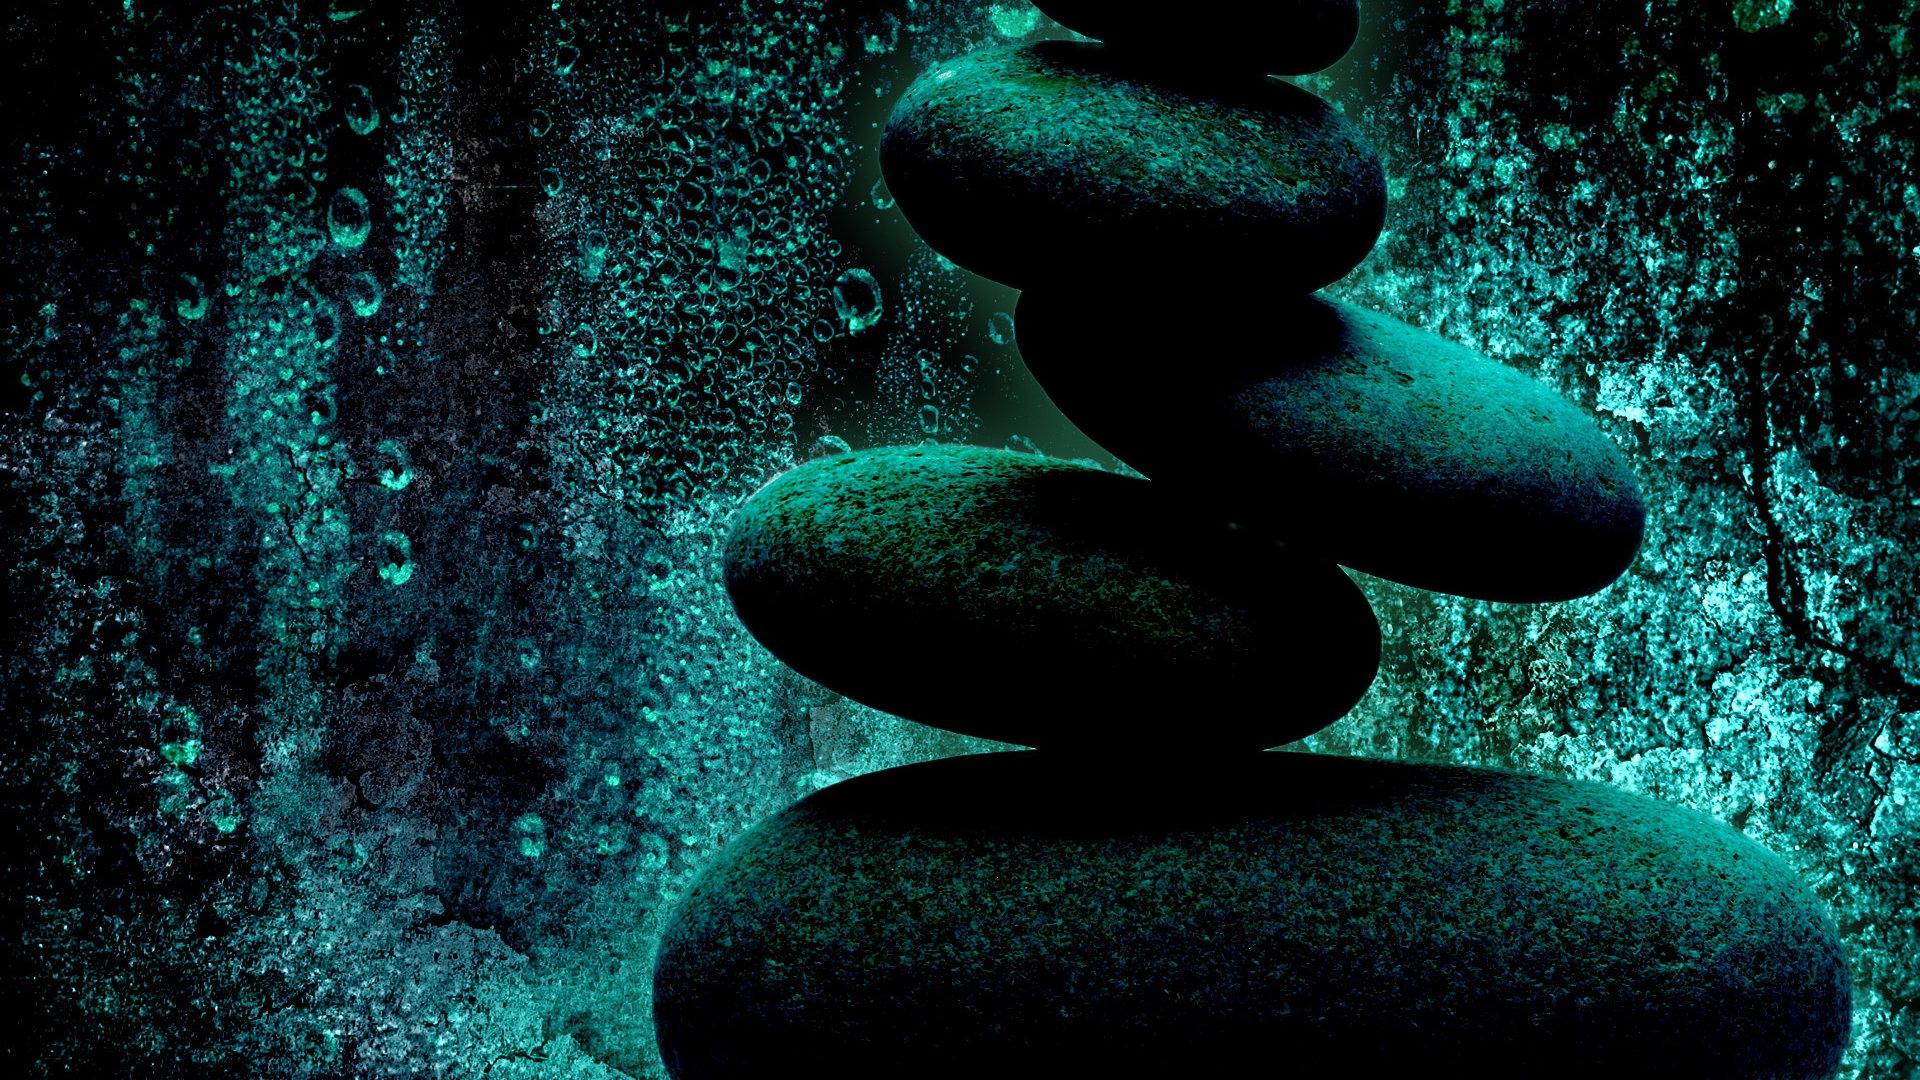 QuidsUp amazingstones1920x1080wallpaper2639jpg